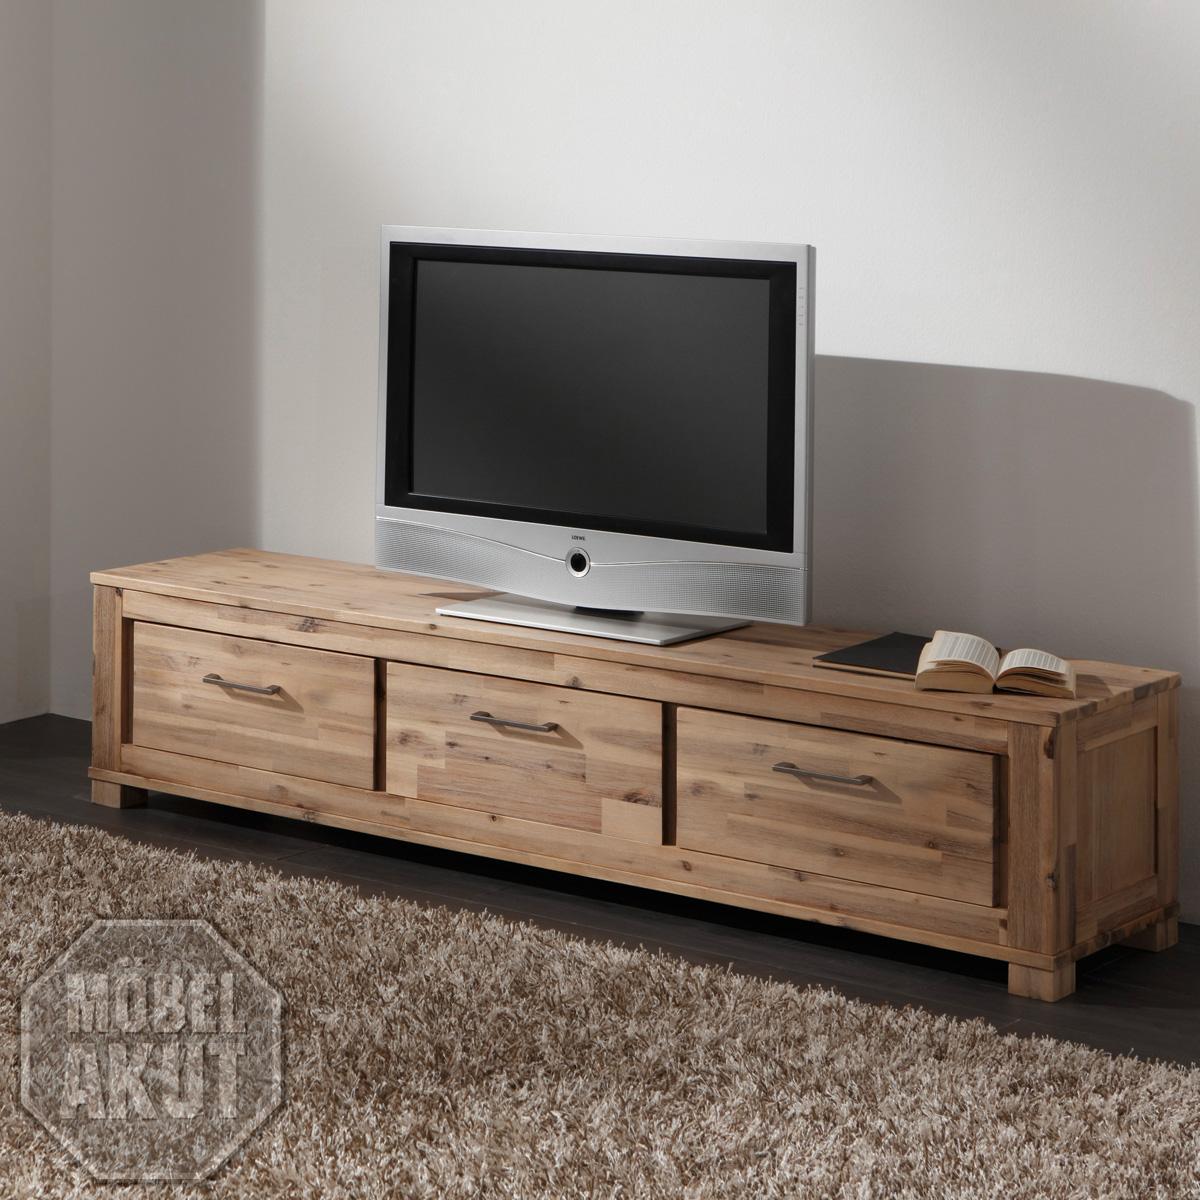 lowboard canaria tv board in akazie massiv sand neu. Black Bedroom Furniture Sets. Home Design Ideas